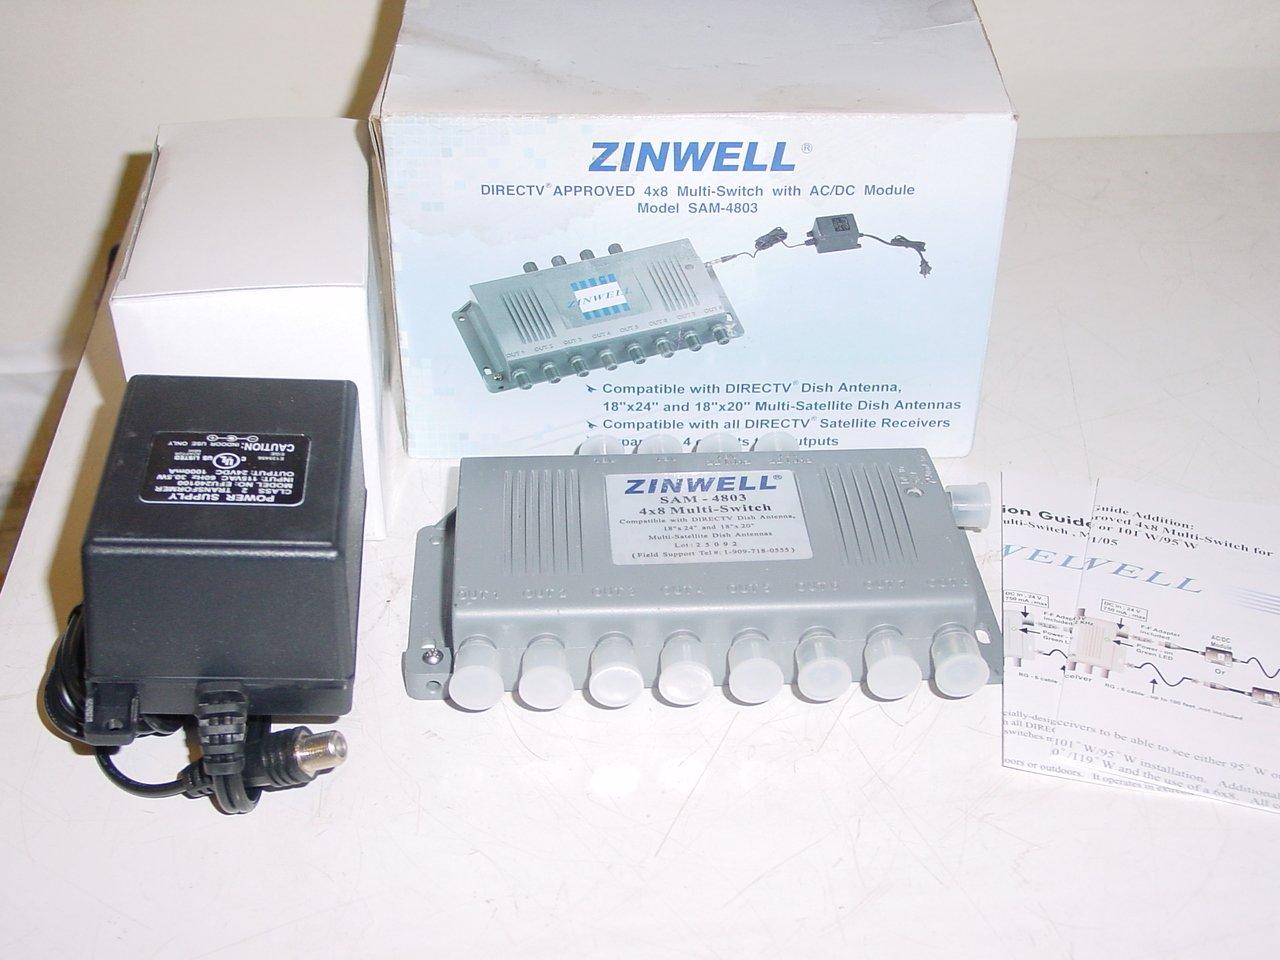 amazon com zinwell 4x8 multi switch ac dc module model amazon com zinwell 4x8 multi switch ac dc module model ms4x8wb z computers accessories